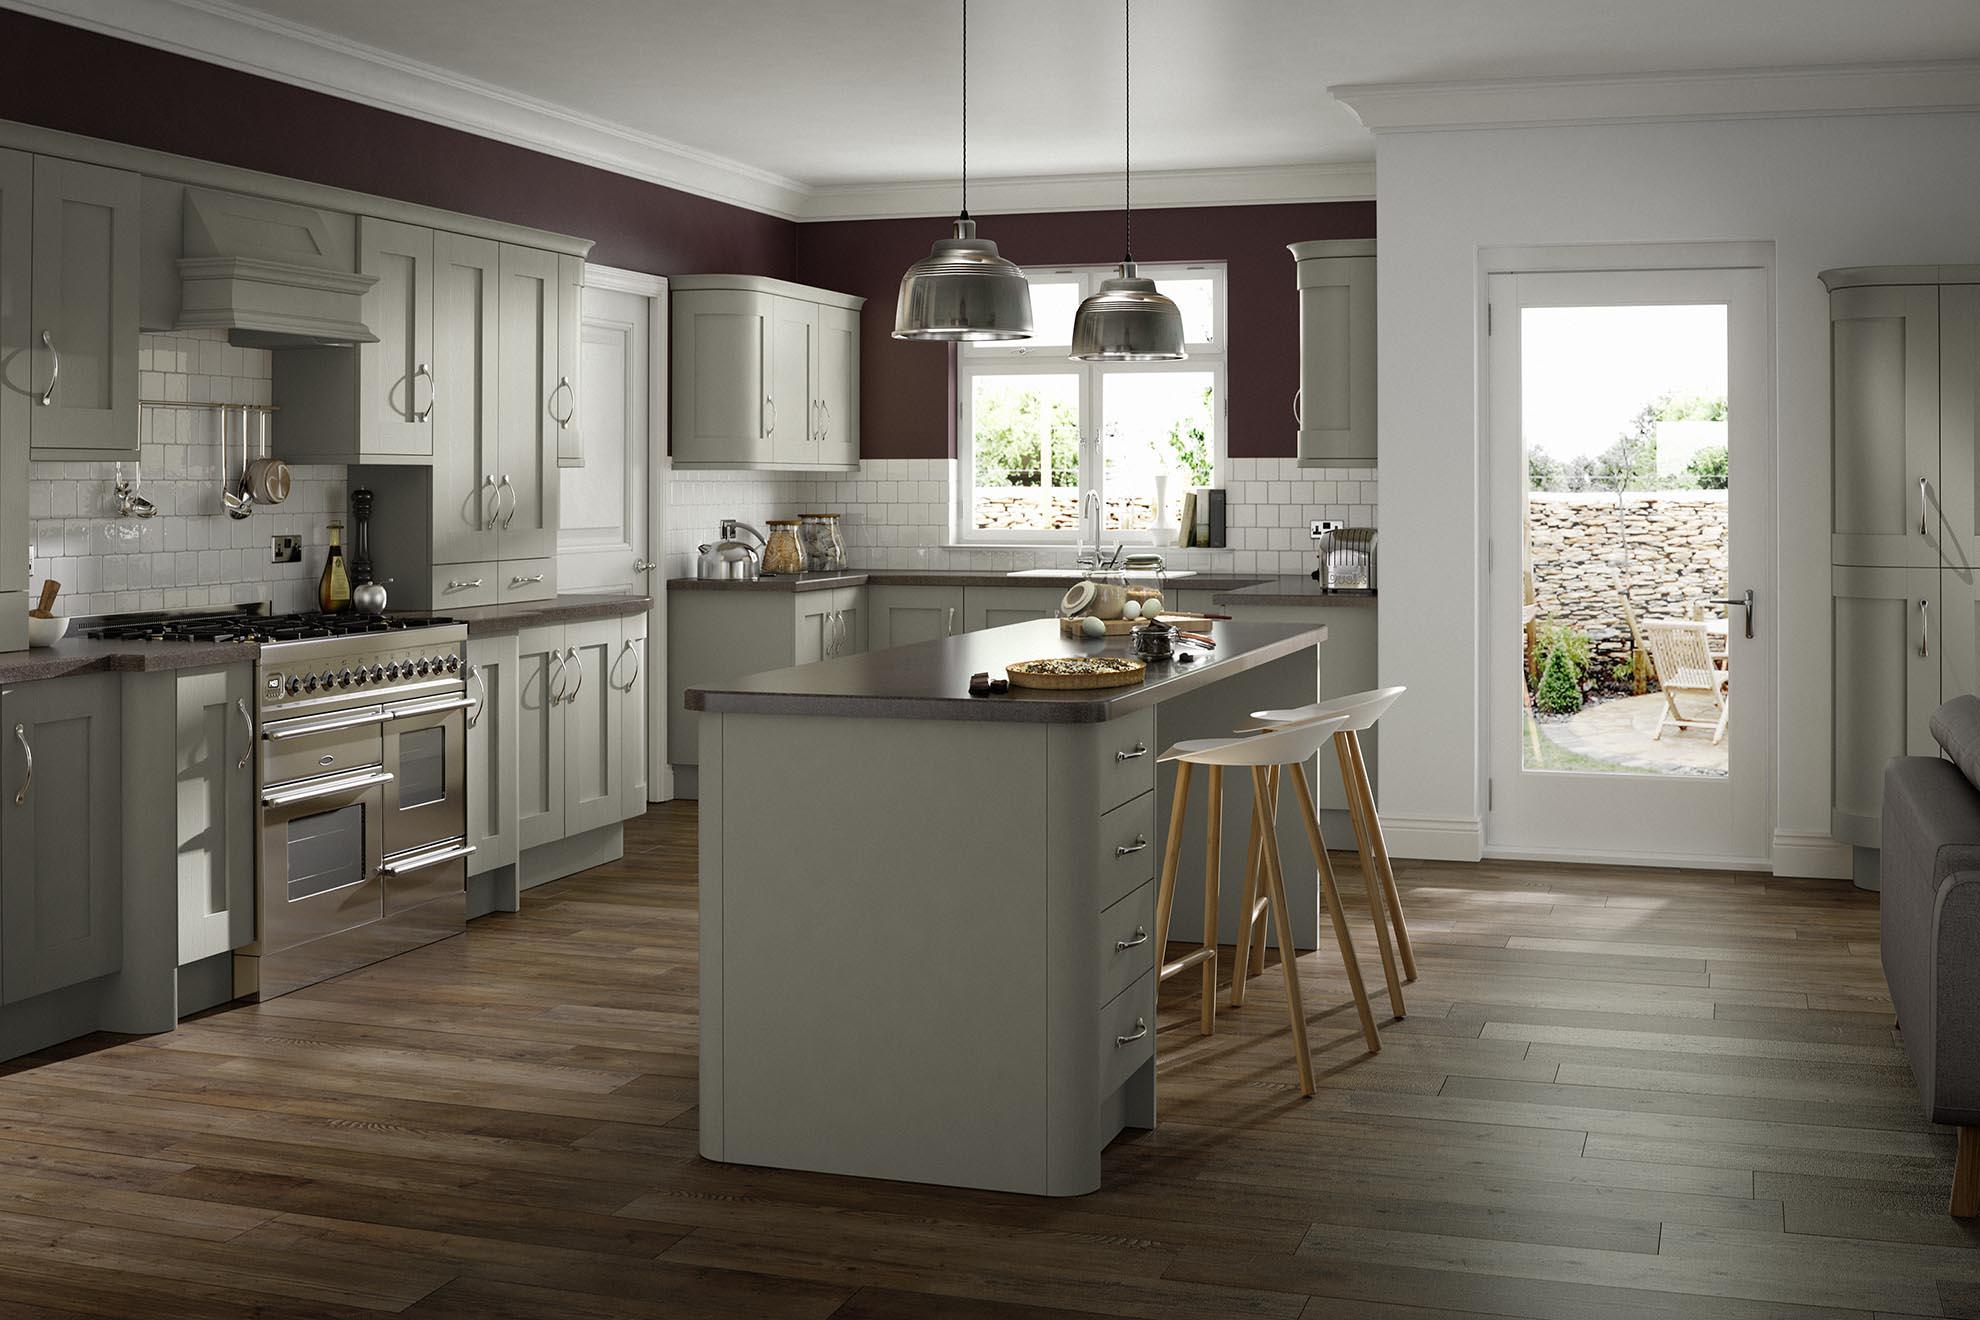 VARALLO Roundel - Dove grey kitchen units